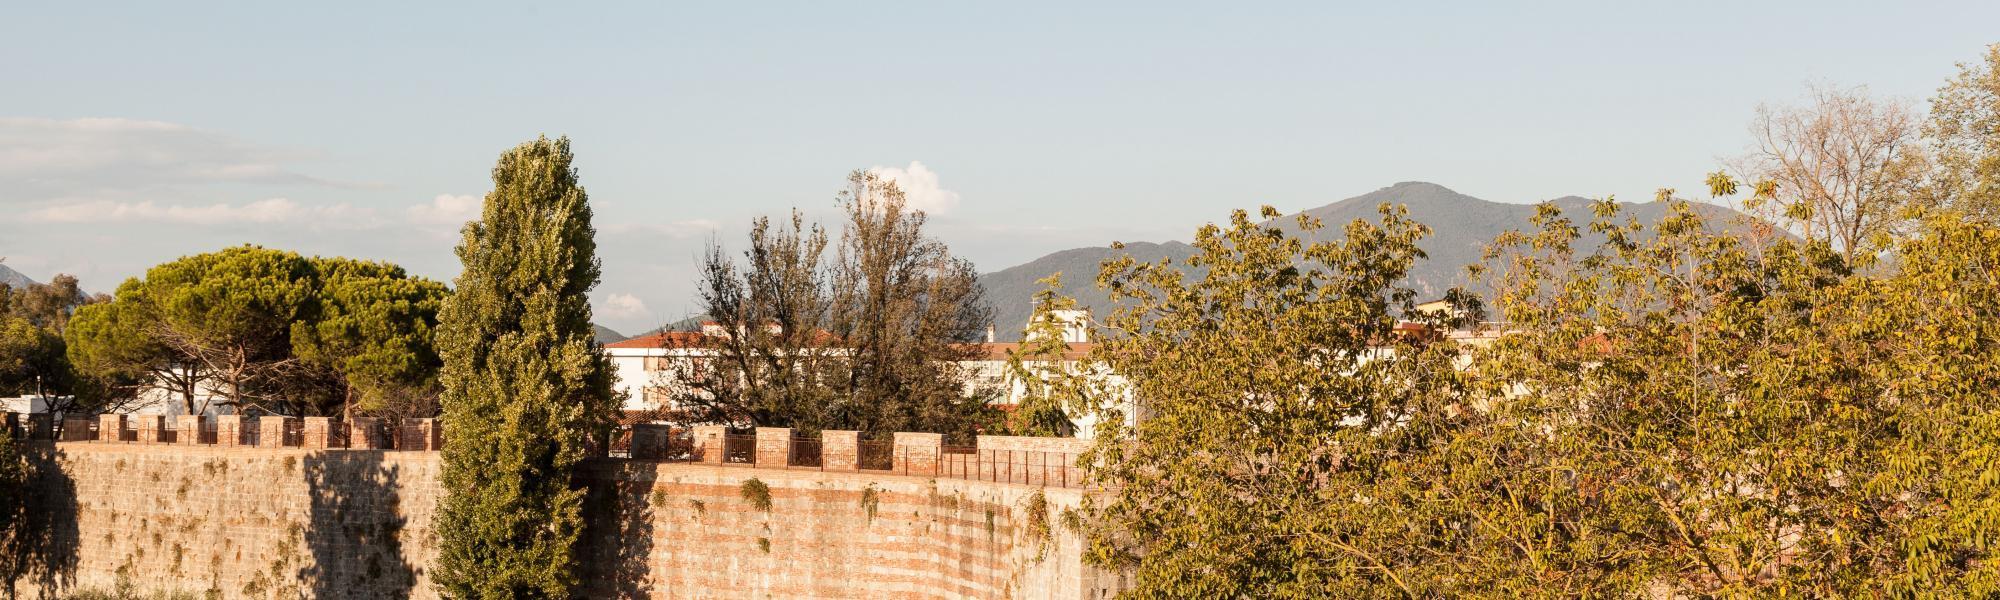 Le mura di Pisa ( da Mura di Pisa, www.muradipisa.it)